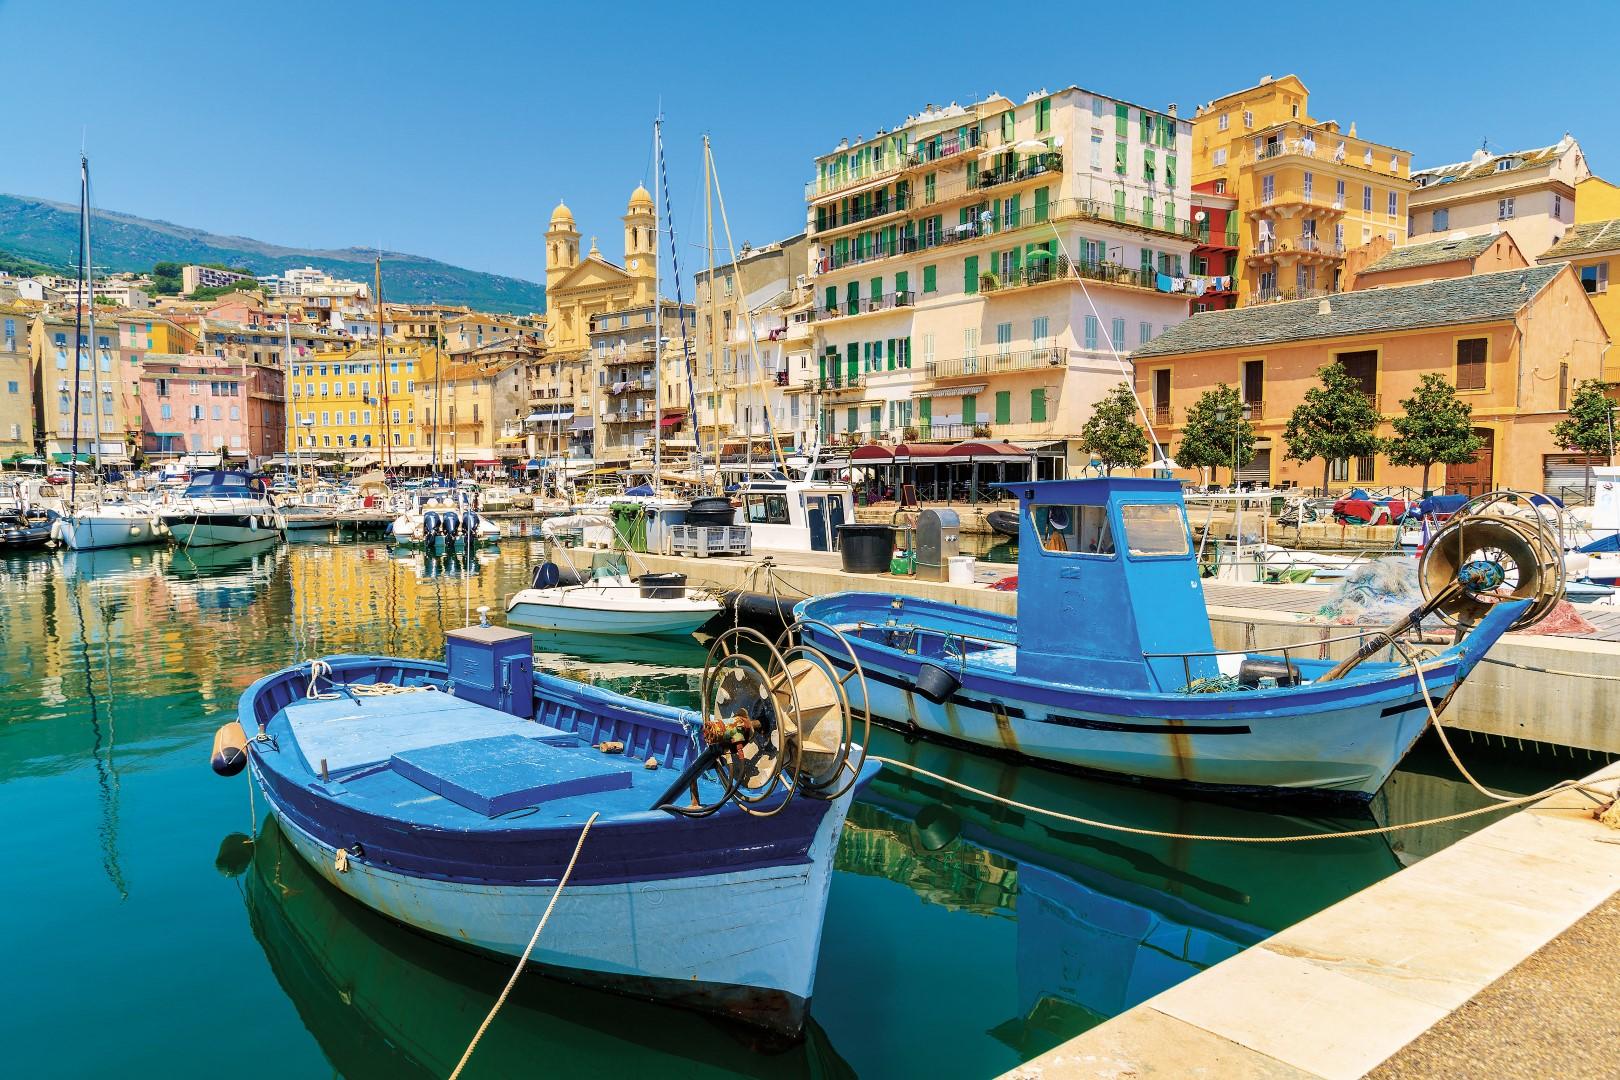 Divoká krása Korsiky (autobusem) #3